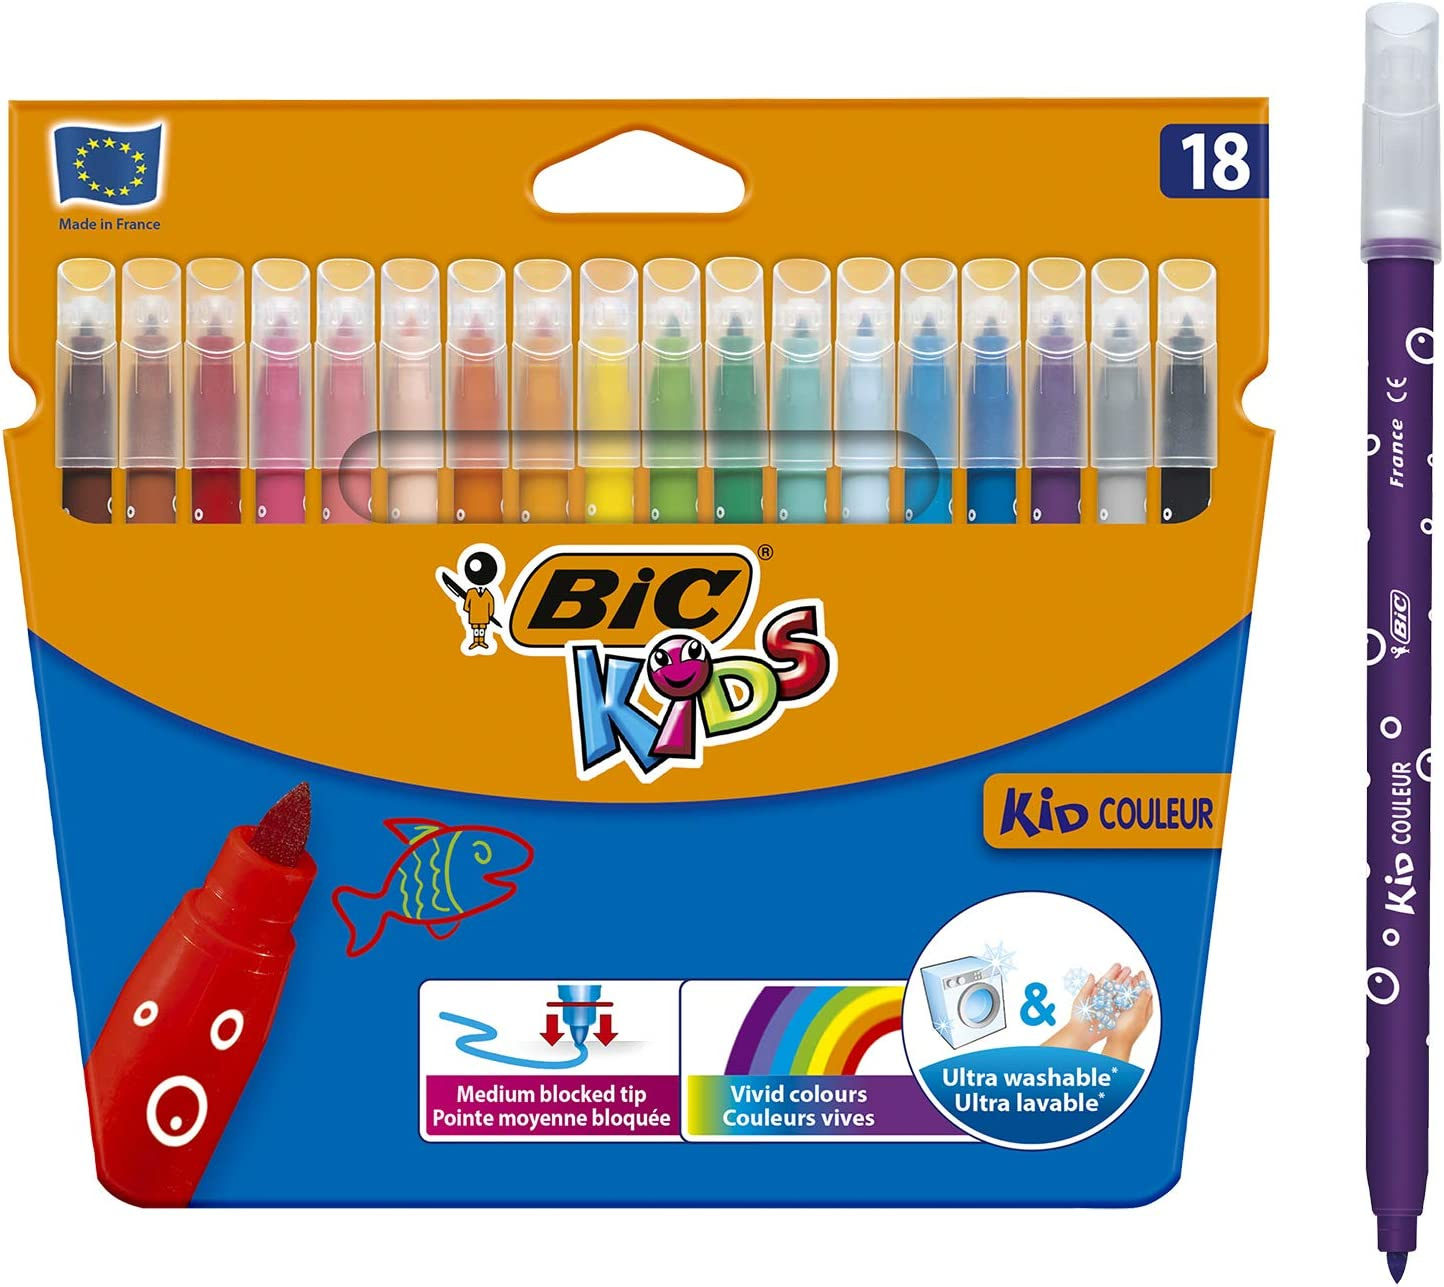 BIC Kids Kid Couleur Felt Tip Colouring Pens (Wallet of 18) 72% OFF £2.49 @ Amazon